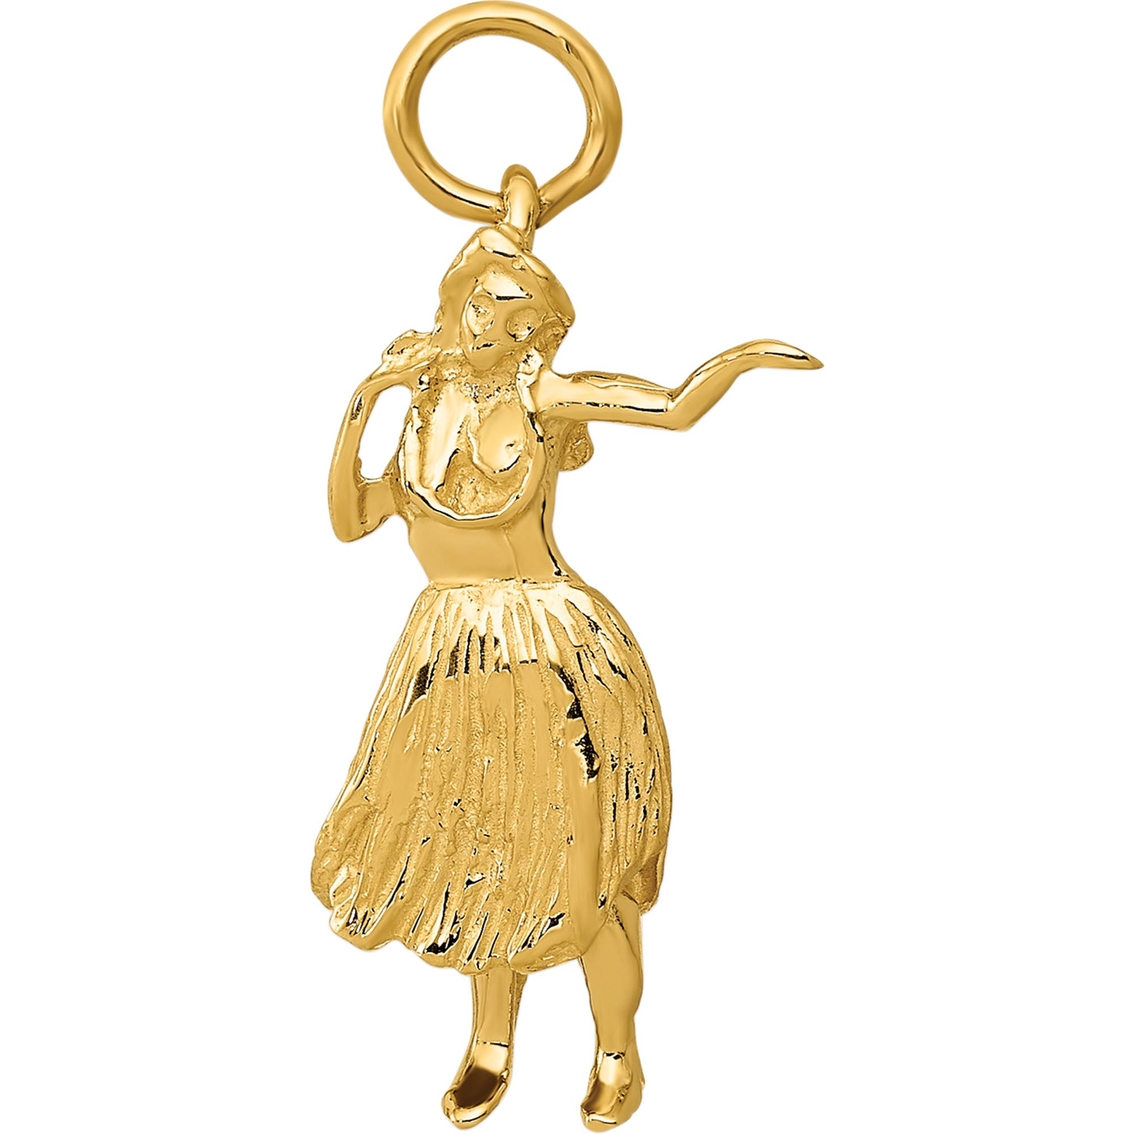 14k Yellow Gold Polished Dancer Charm